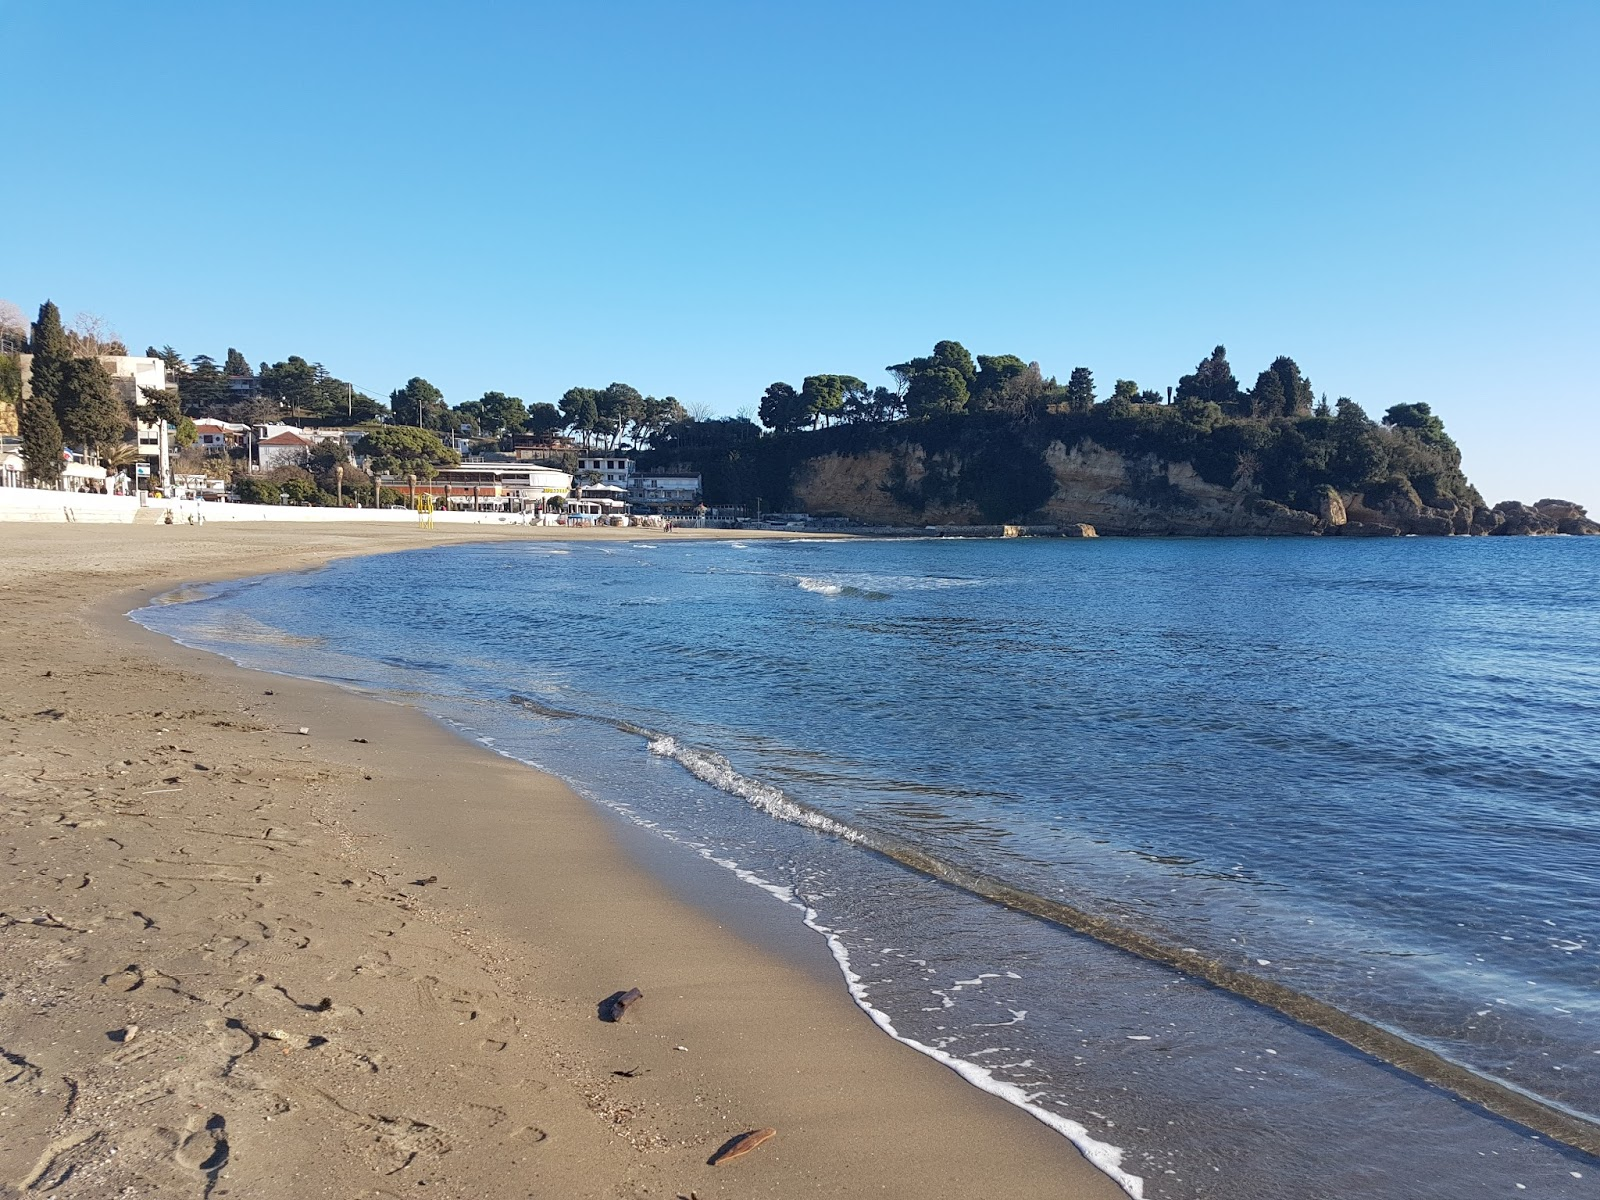 Gradska plaža, Ulcinj, pesak